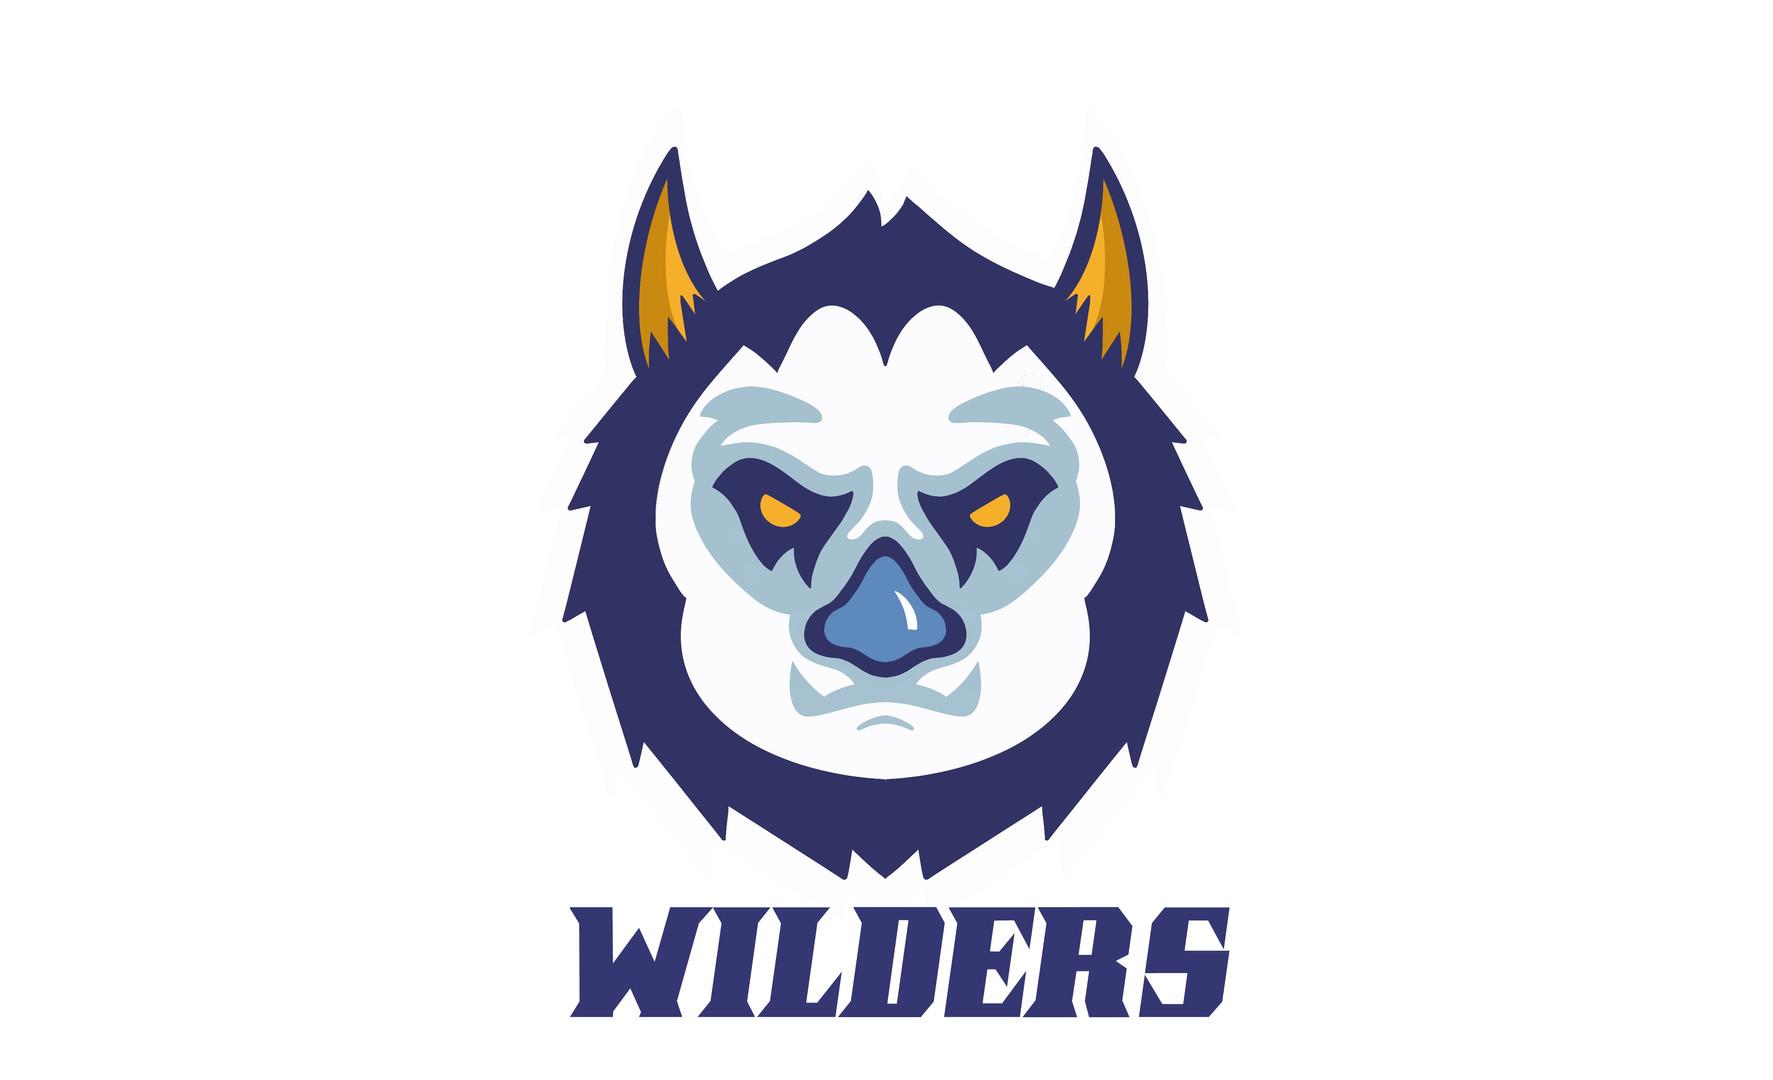 Wilders Basketball Team Logo